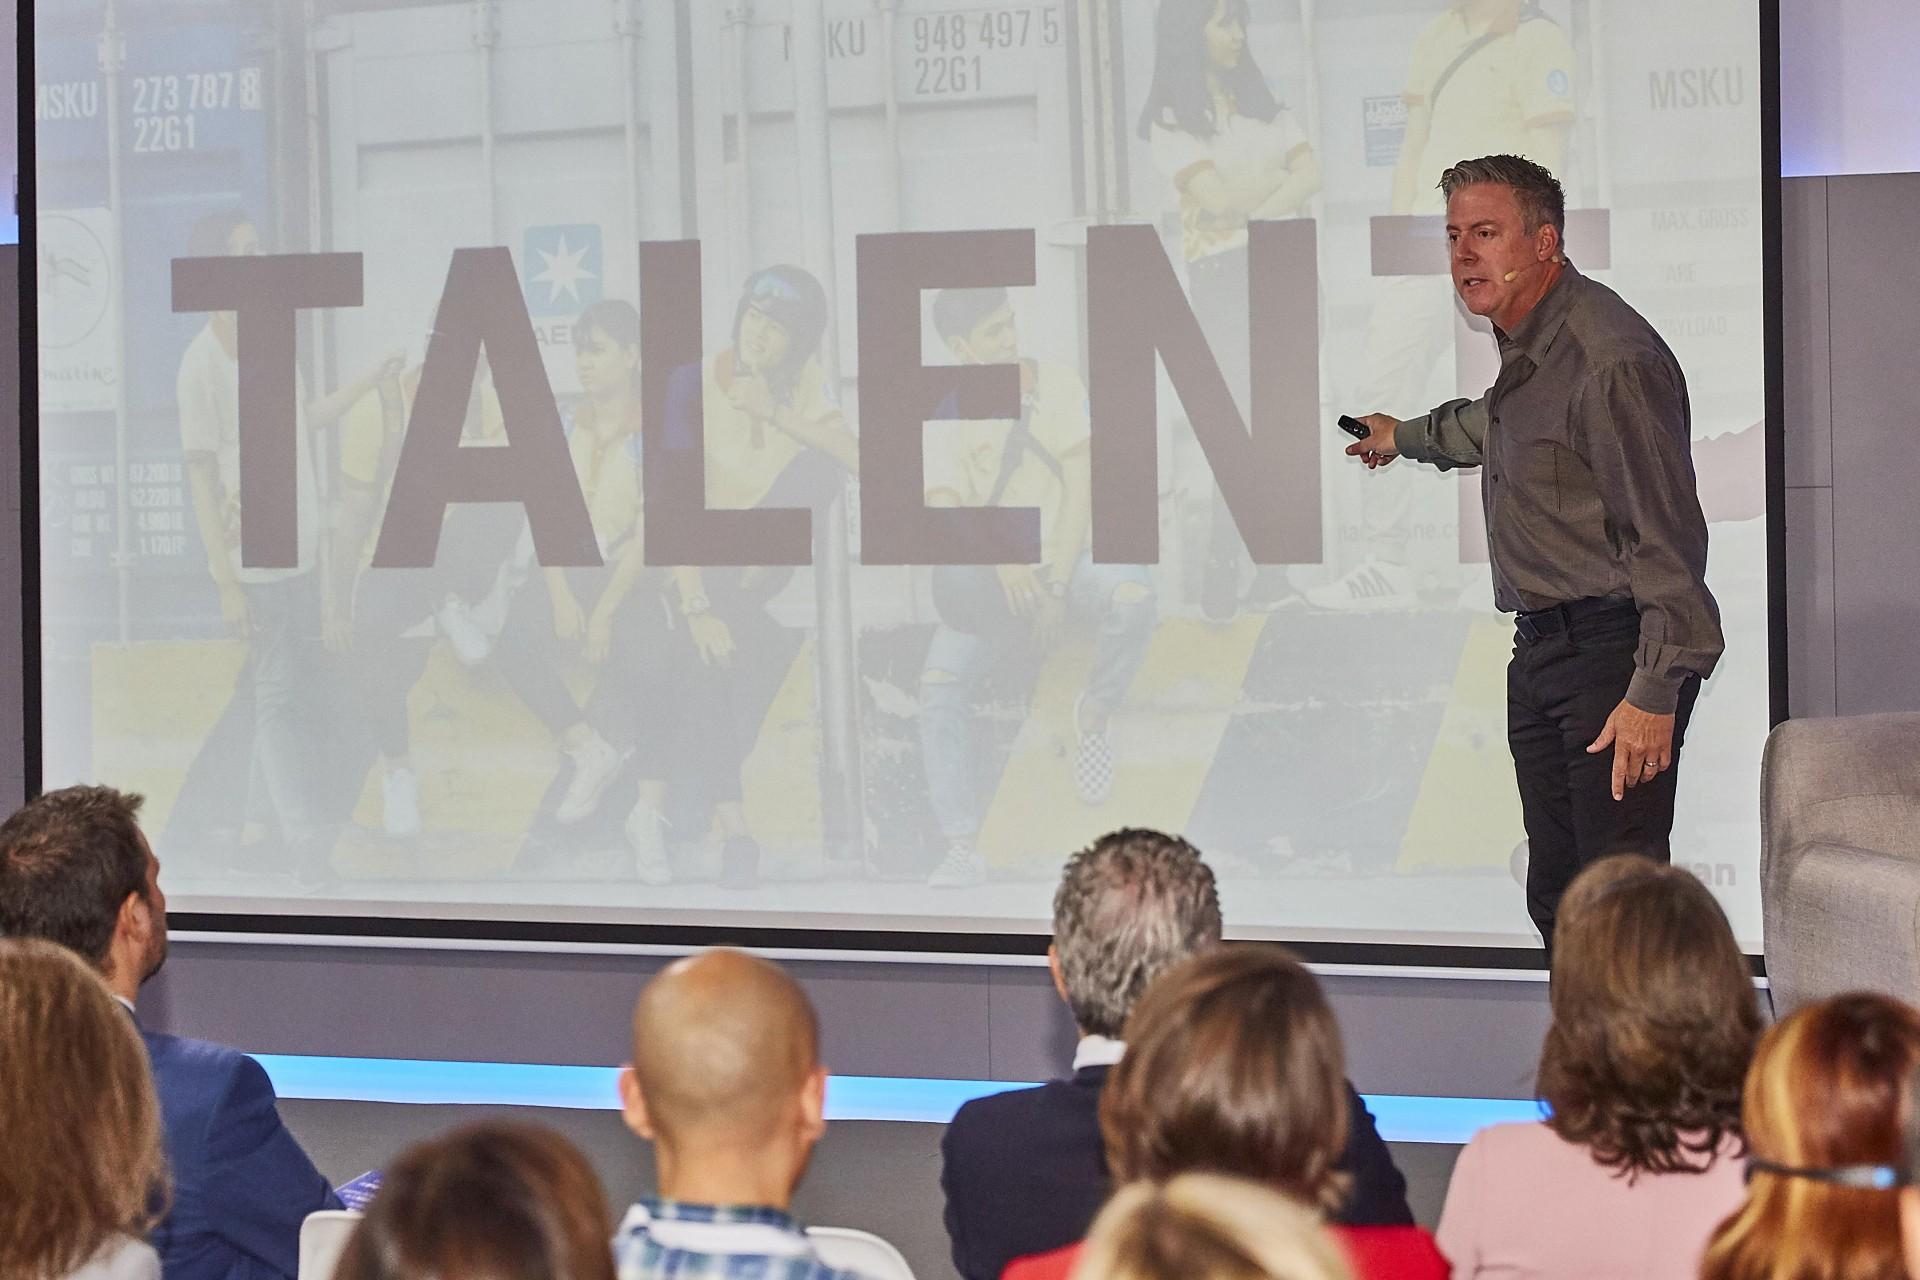 Steve Cadigan habla de Talento en el Update